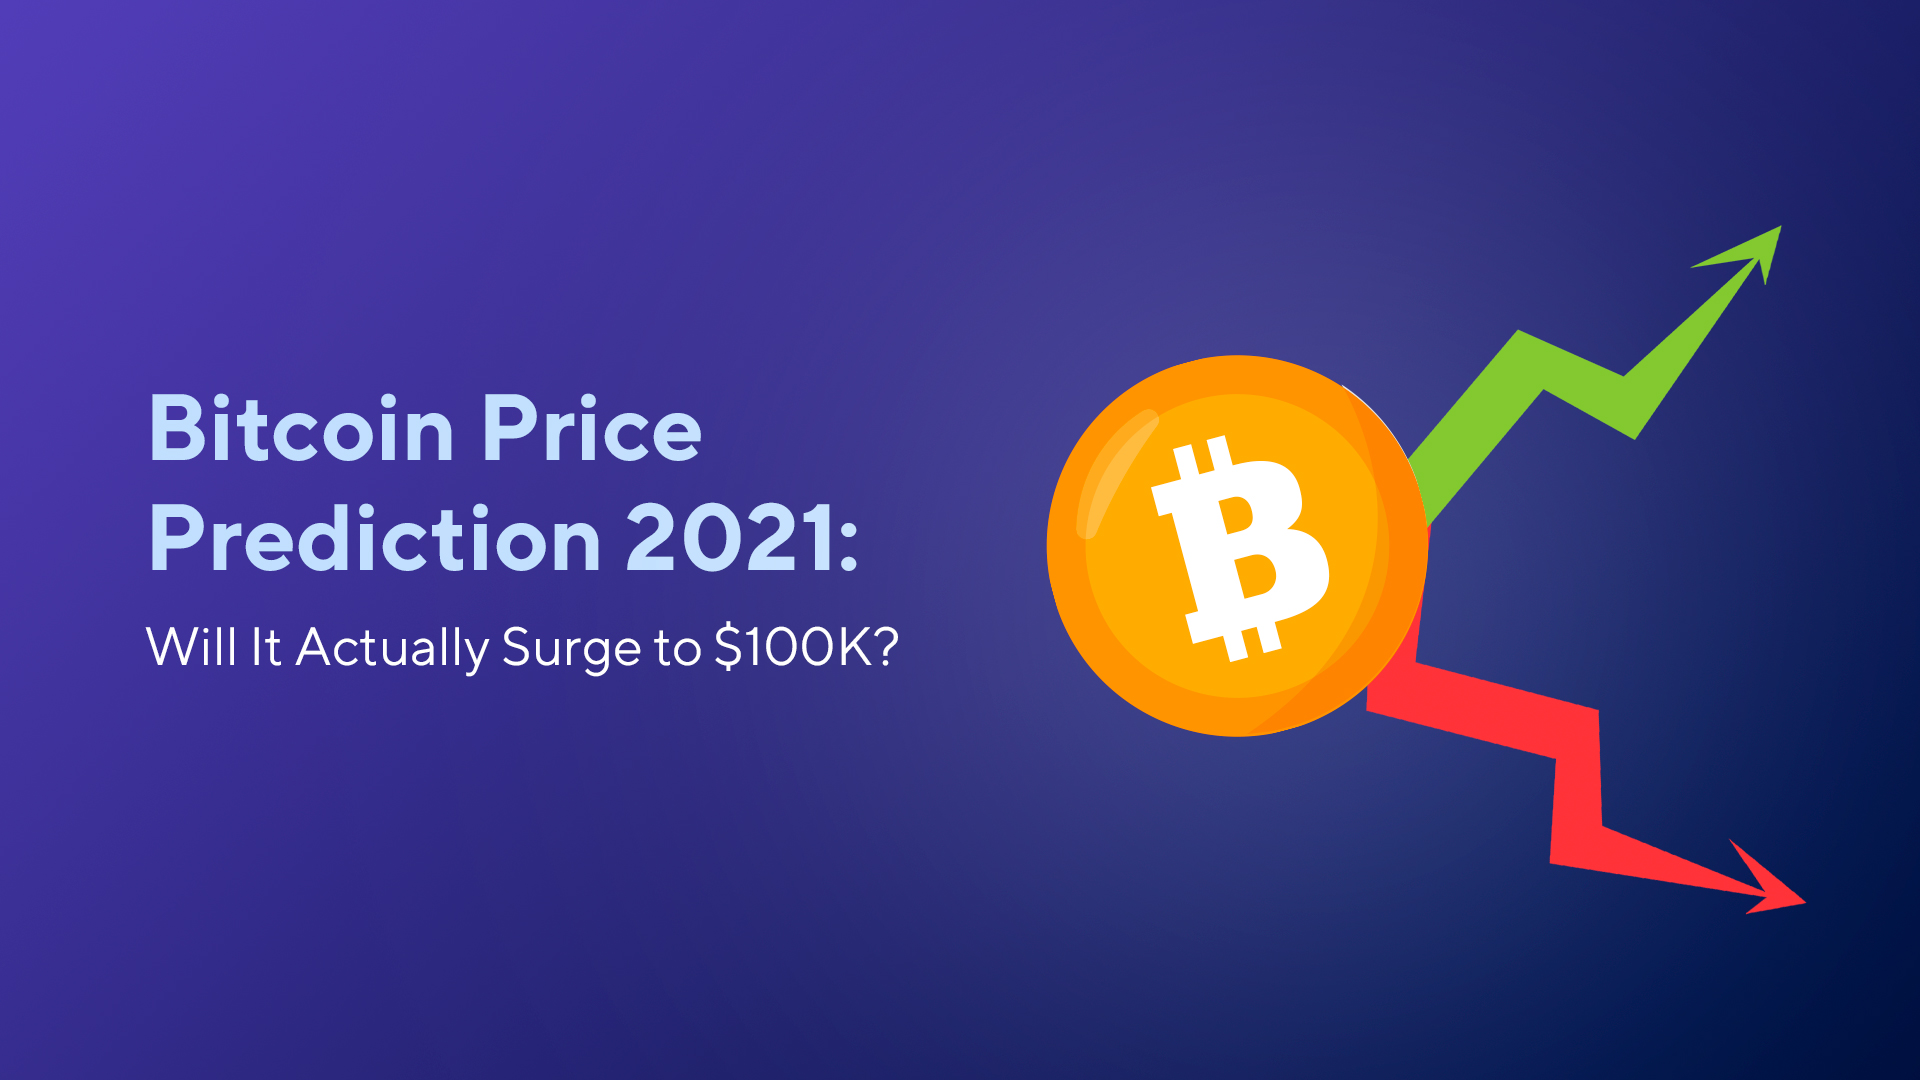 Bitcoin Price Prediction 2021: Will It Actually Surge to $100K?